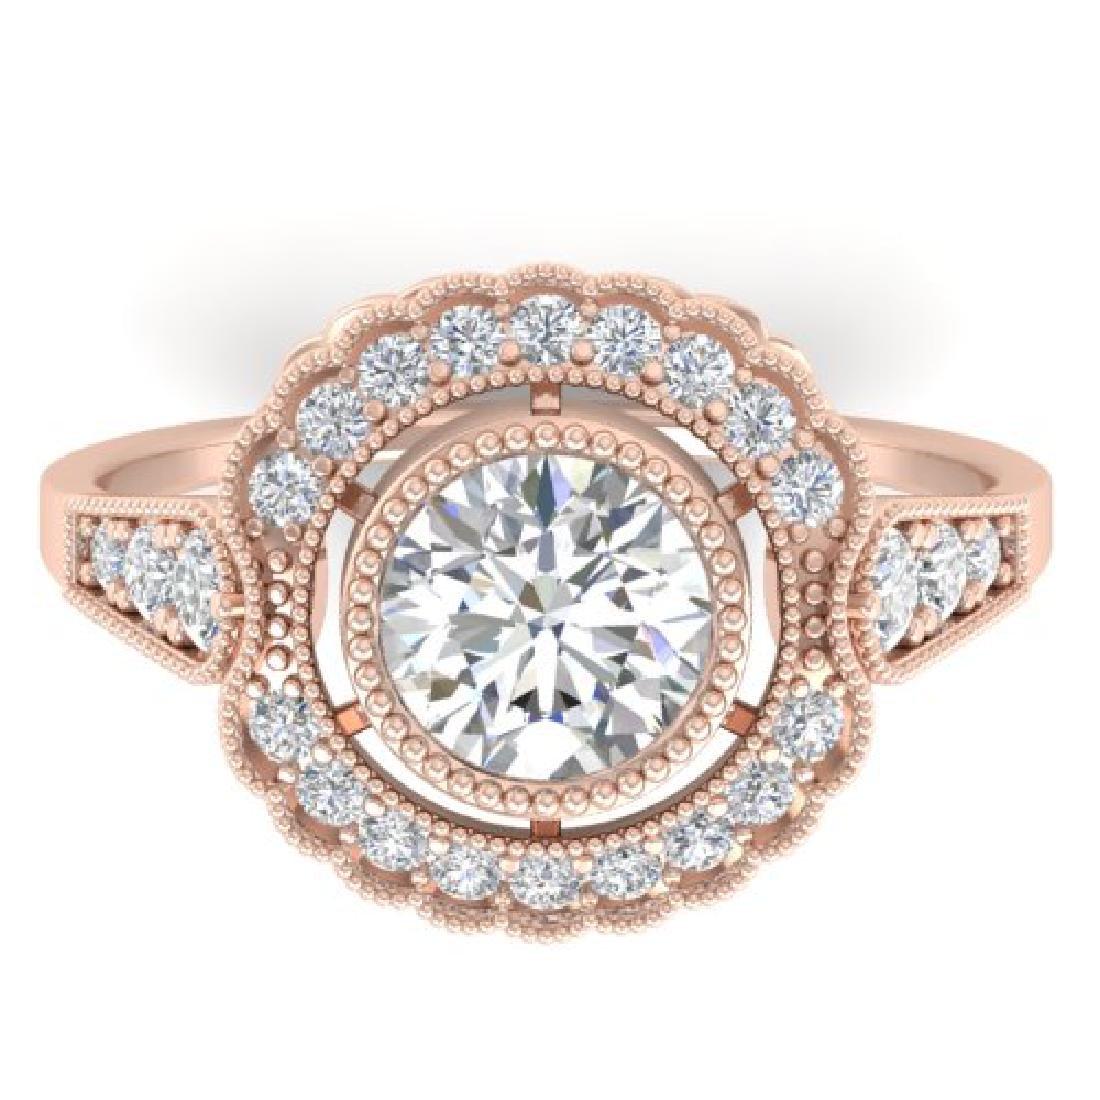 1.55 CTW Certified VS/SI Diamond Solitaire Art Deco